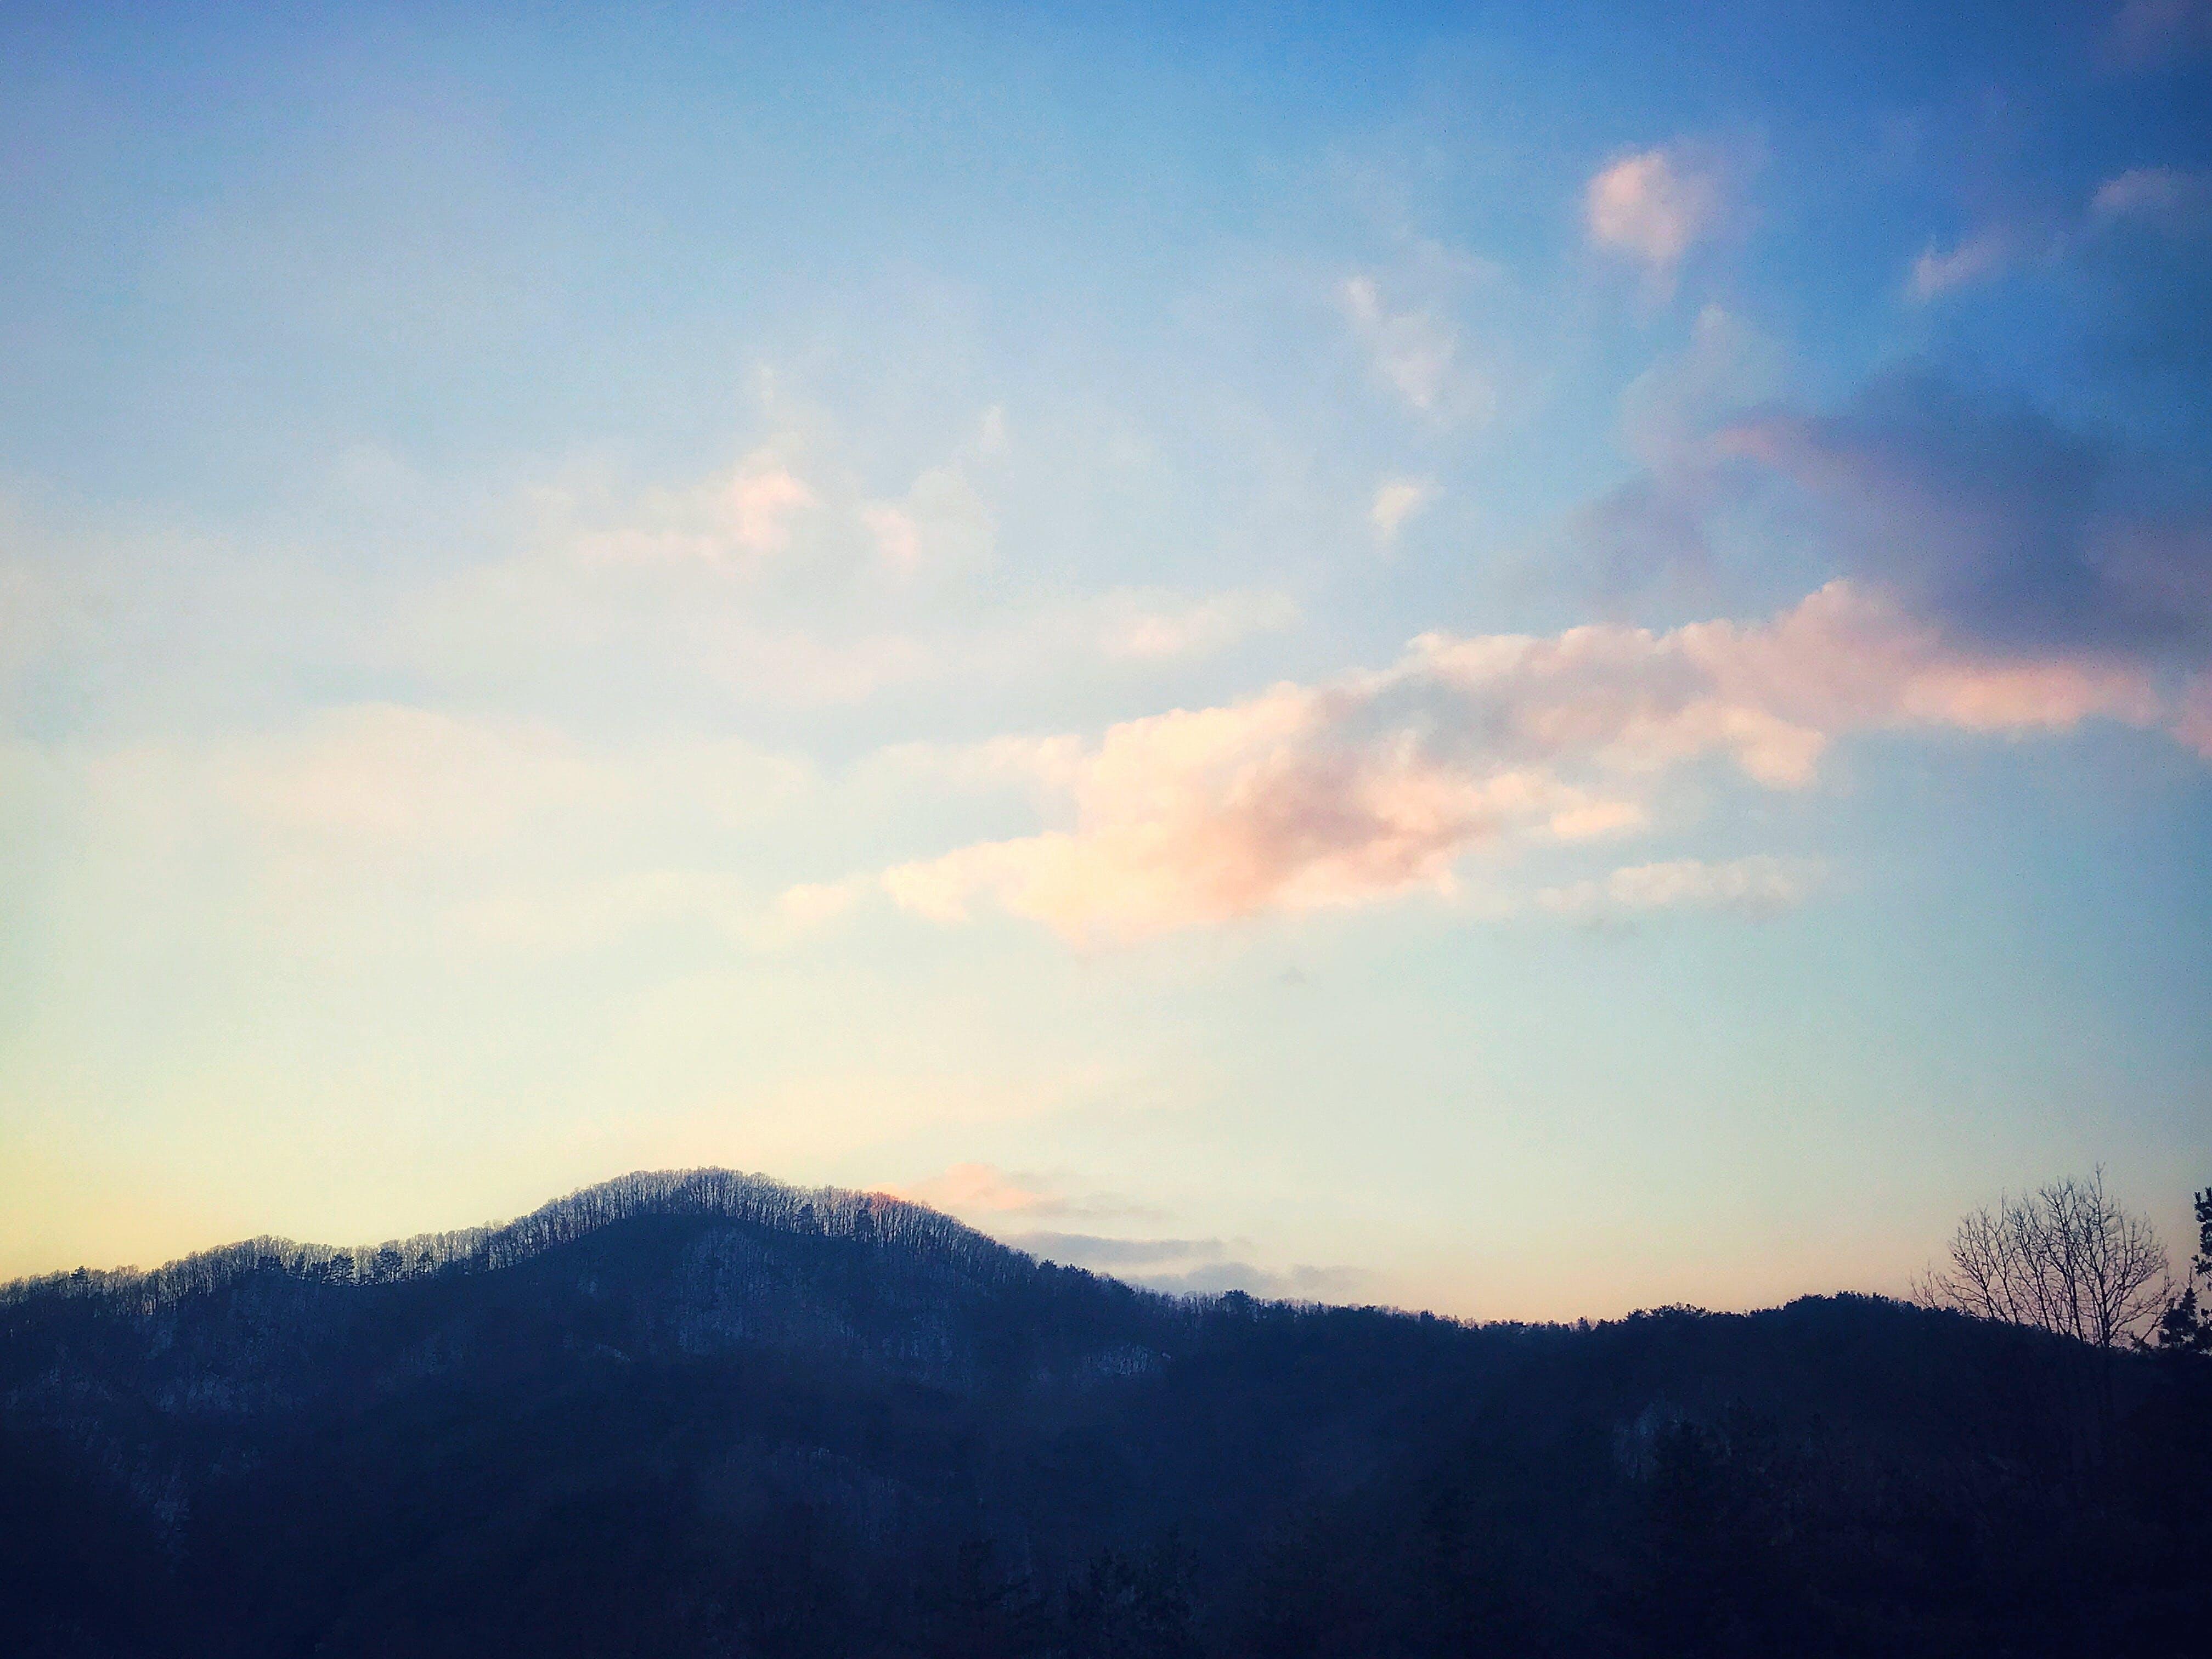 Free stock photo of cloudy sky, mountain, sky, tree